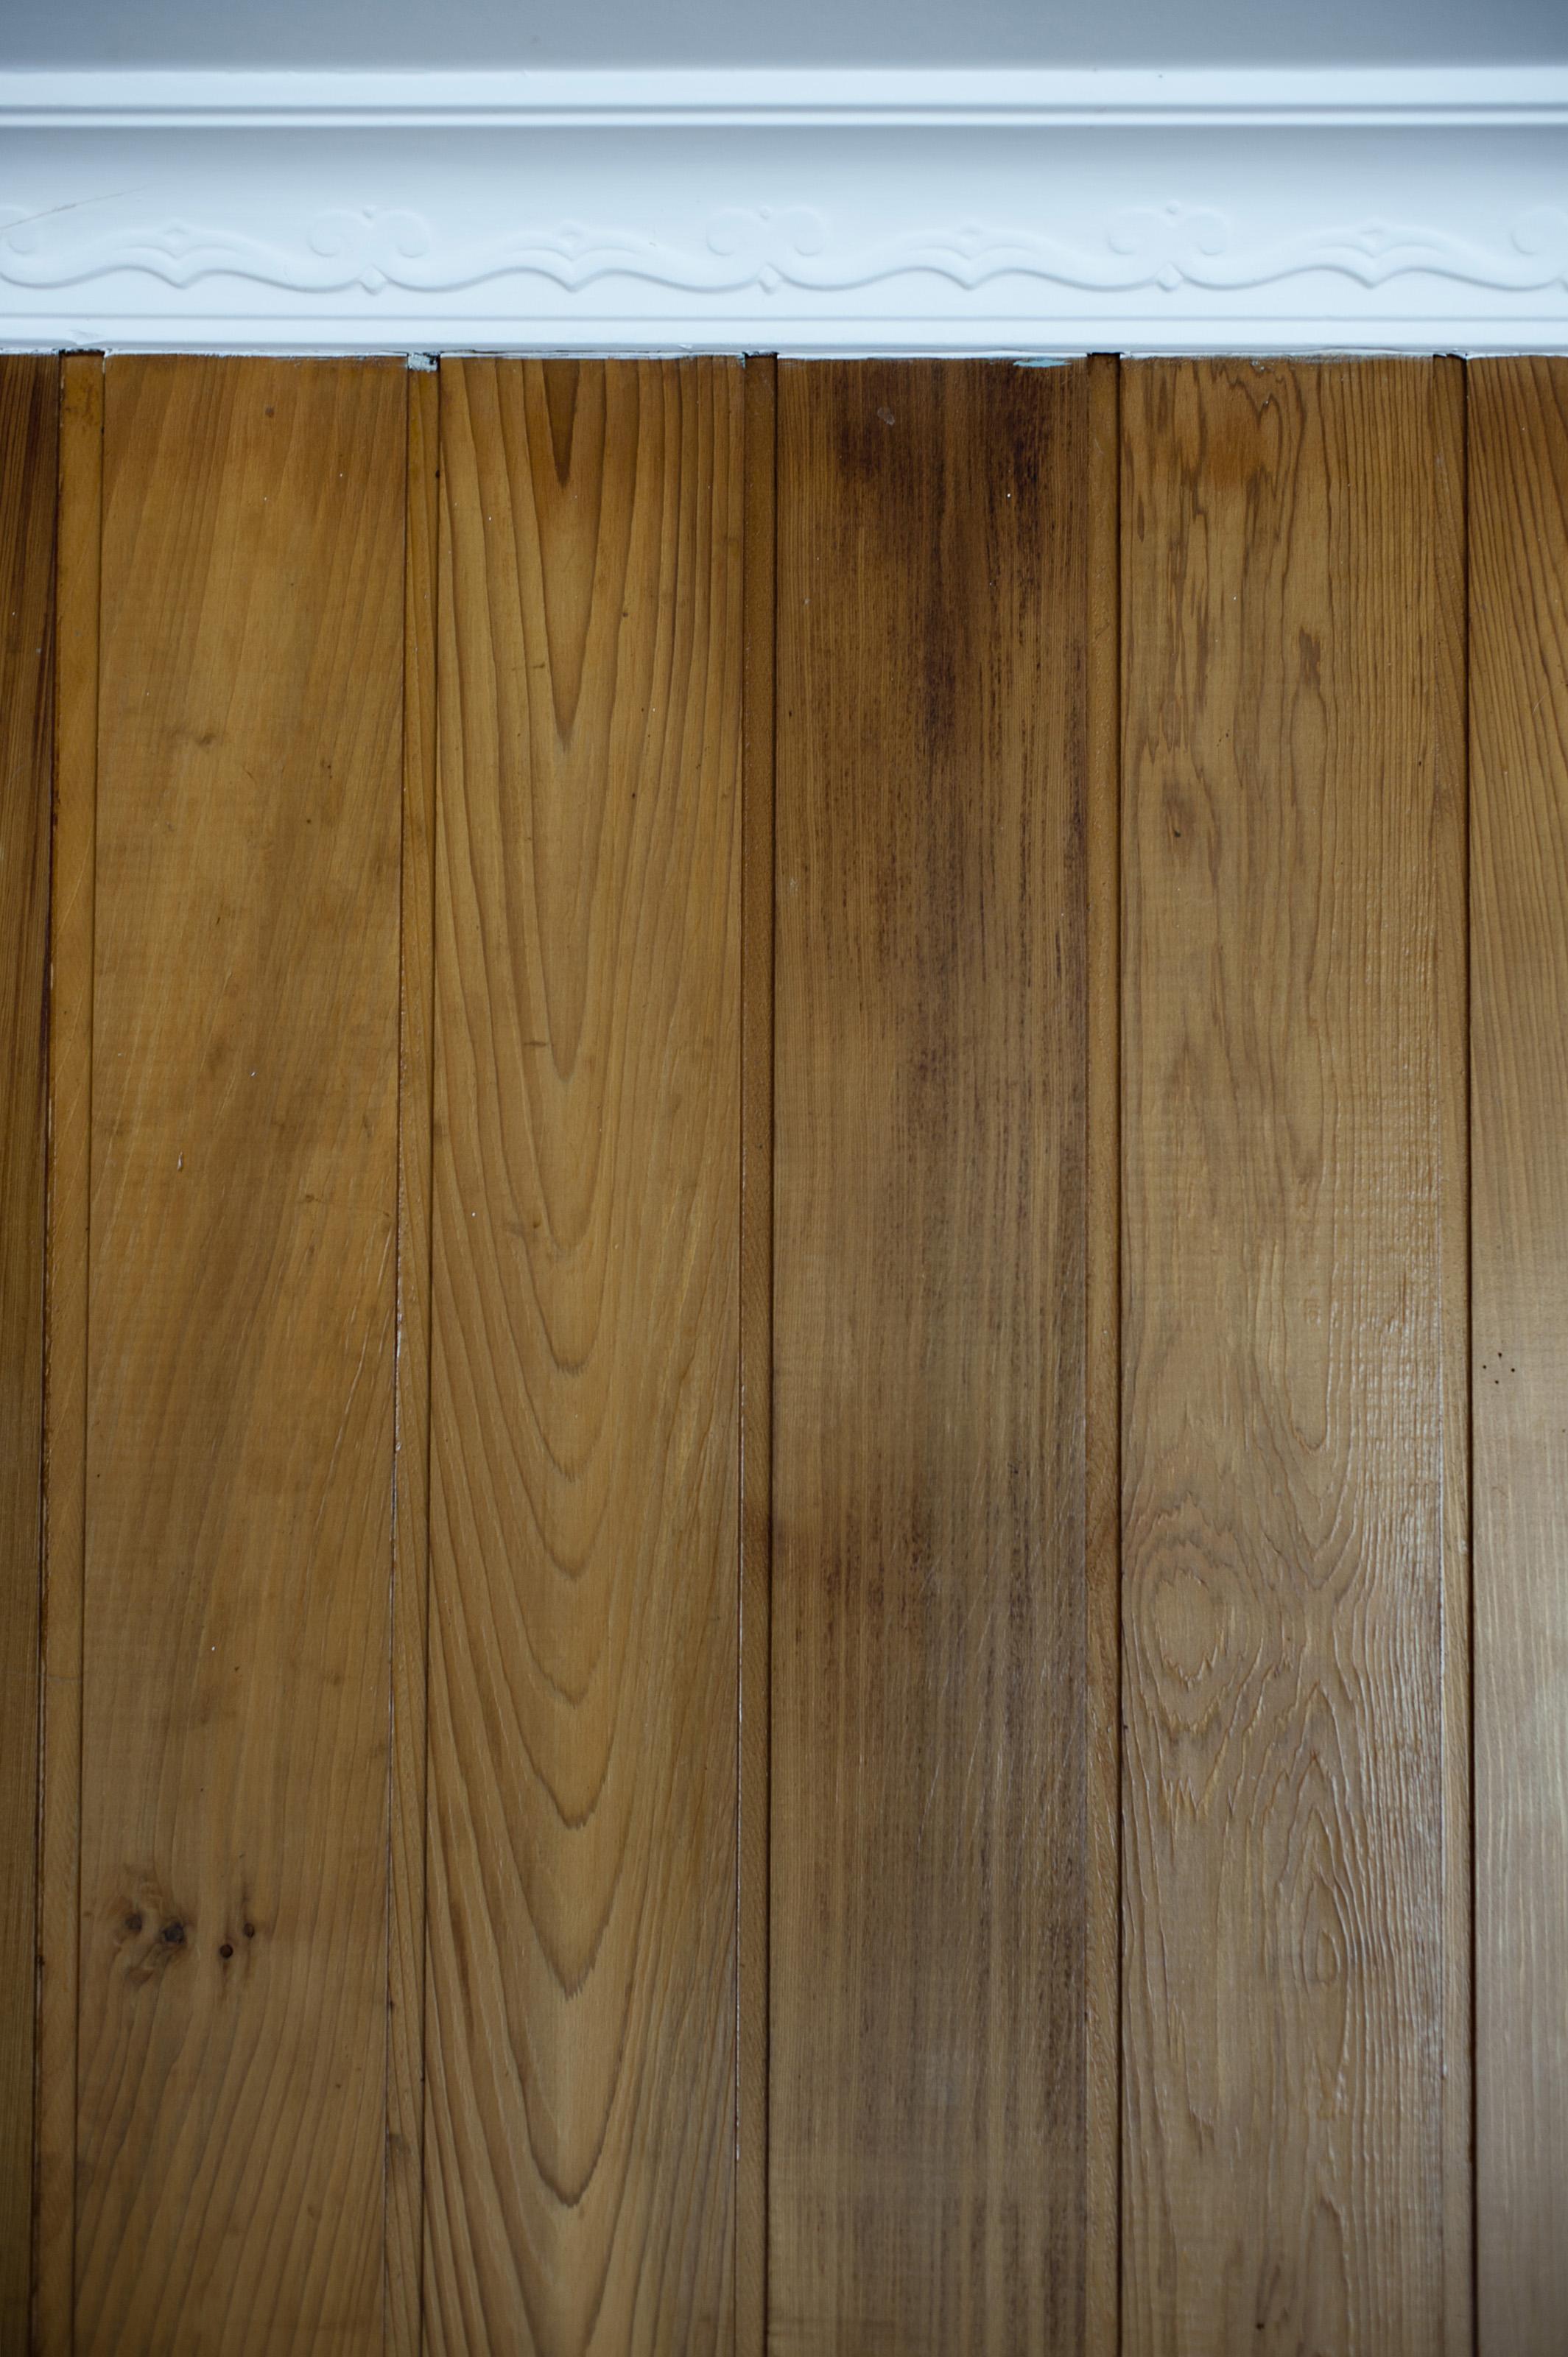 Wood Wall Paneling: Free Stock Photo 10937 Laminate Wood Wall Panels And White